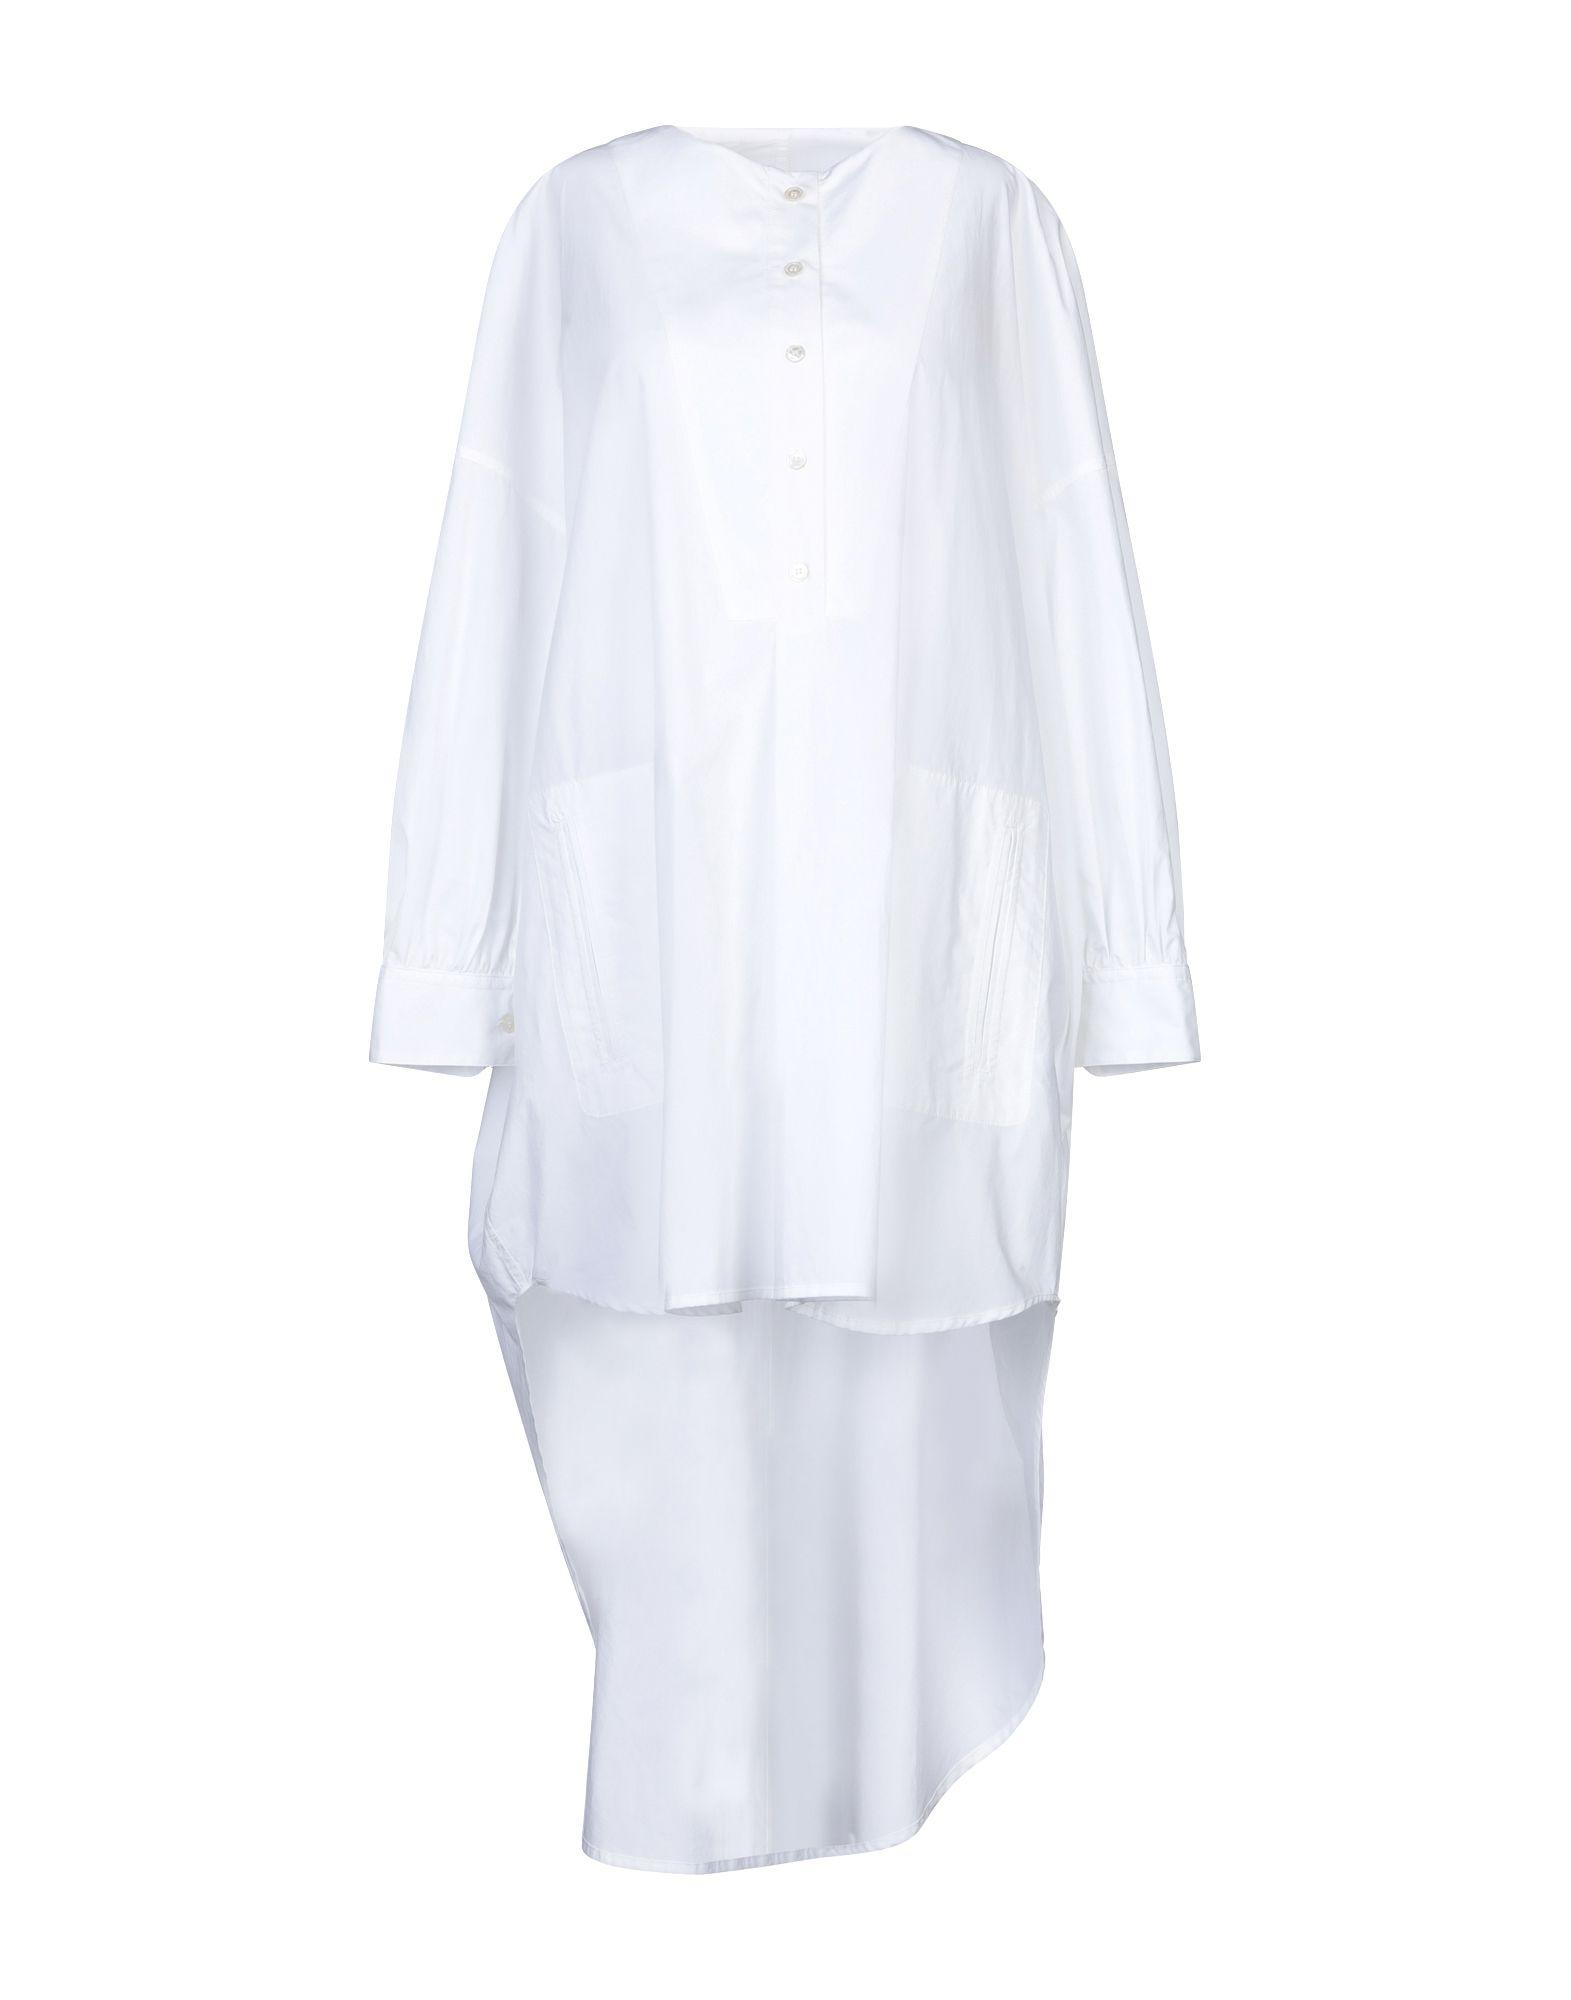 GOLDEN GOOSE DELUXE BRAND Короткое платье